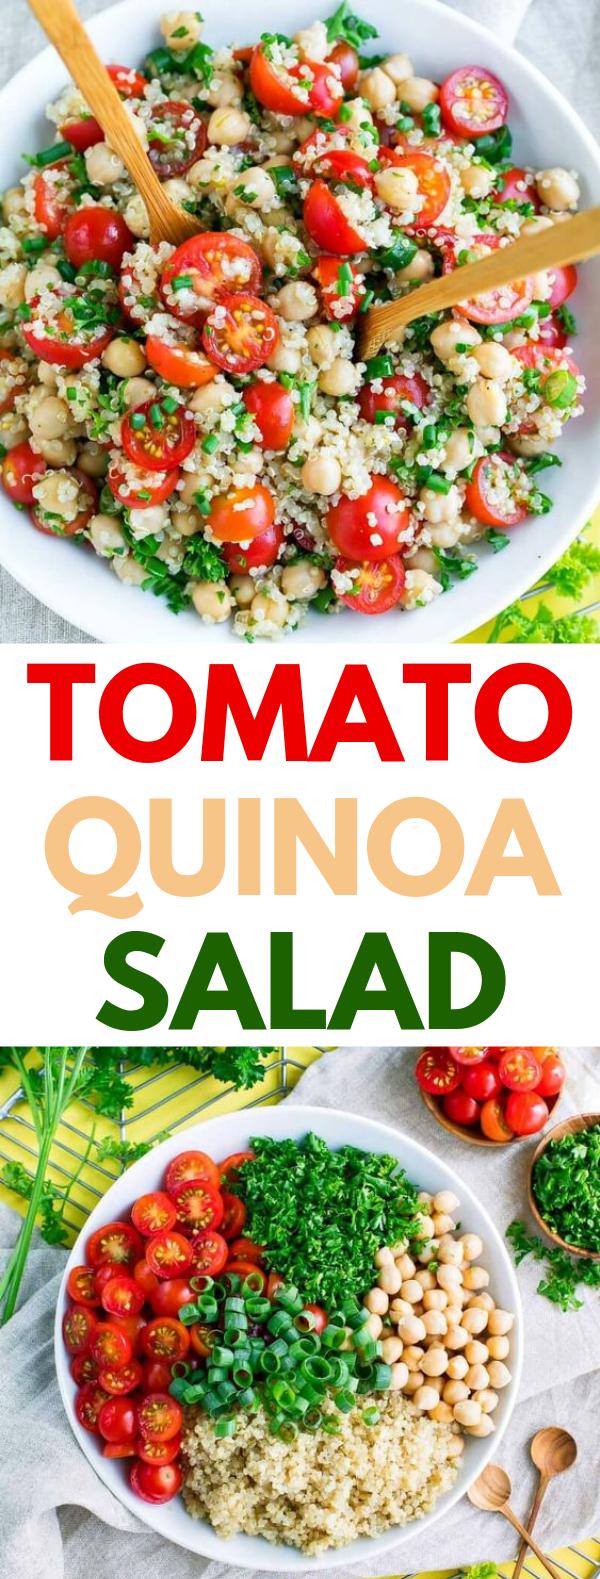 Photo of TOMATO QUINOA SALAD #vegetarian #easysalad